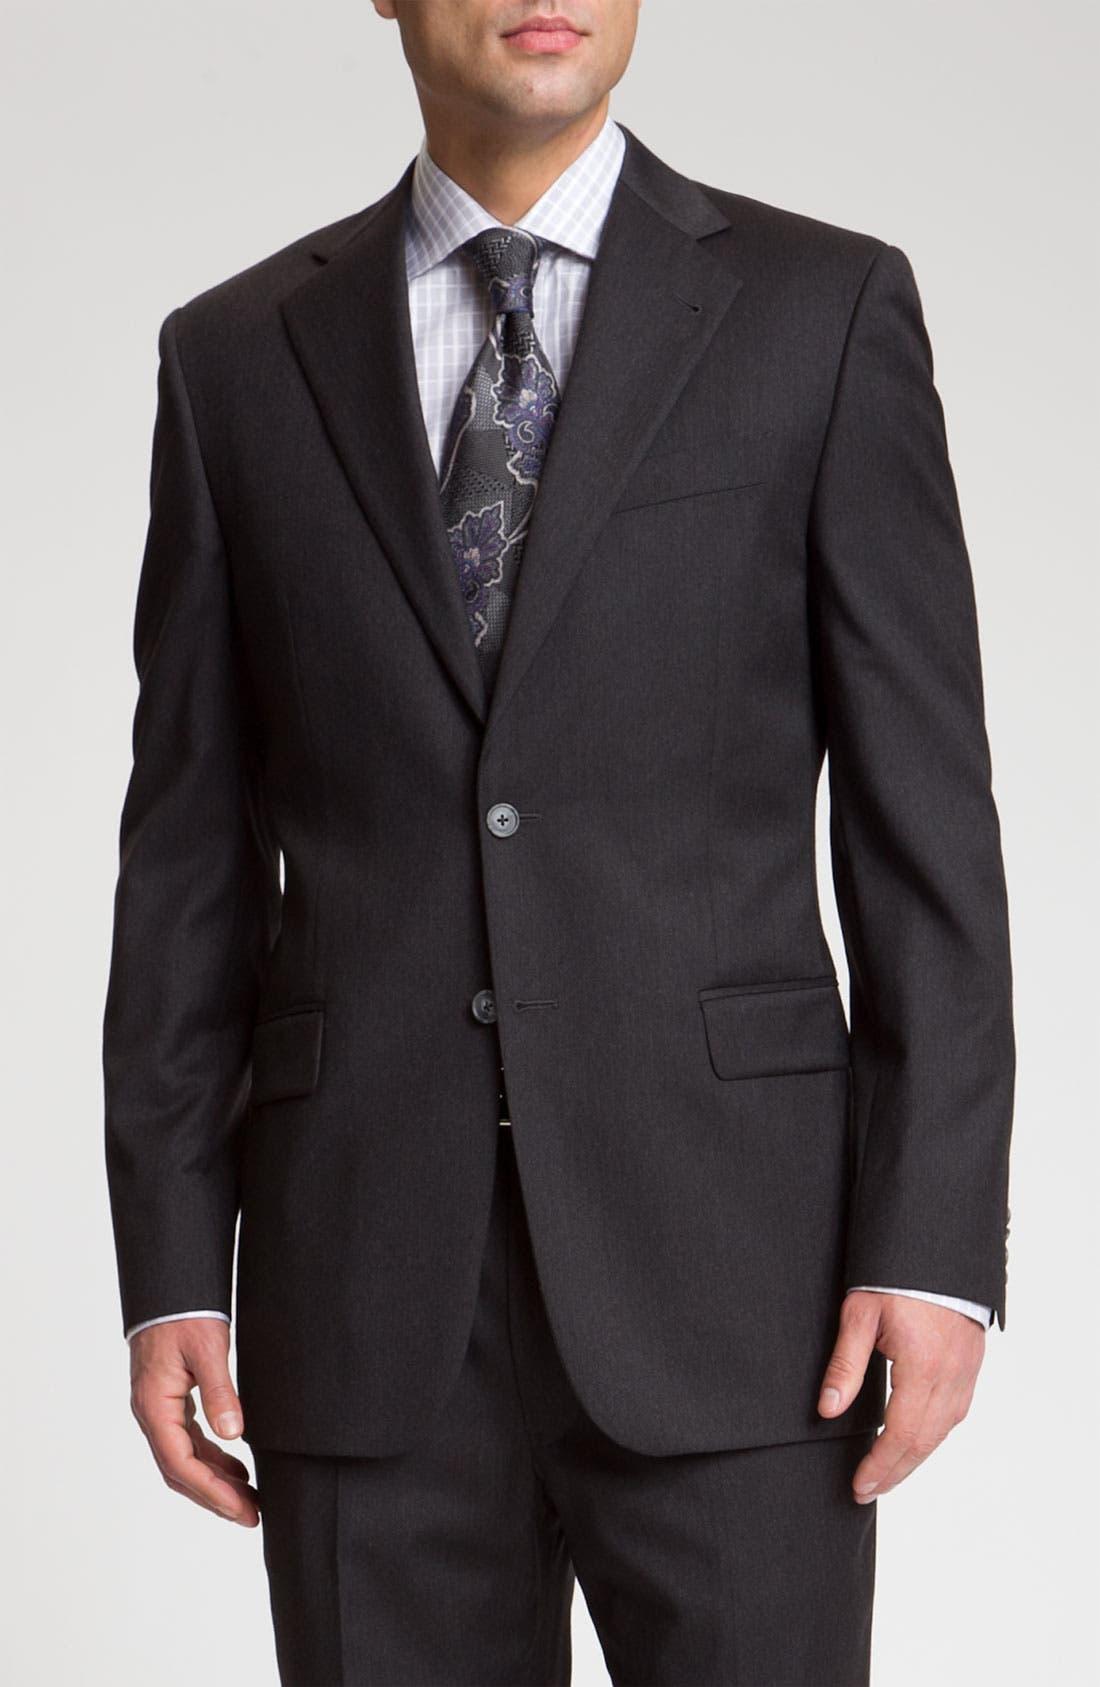 Alternate Image 1 Selected - Joseph Abboud 'Signature Silver' Dark Grey Wool Suit